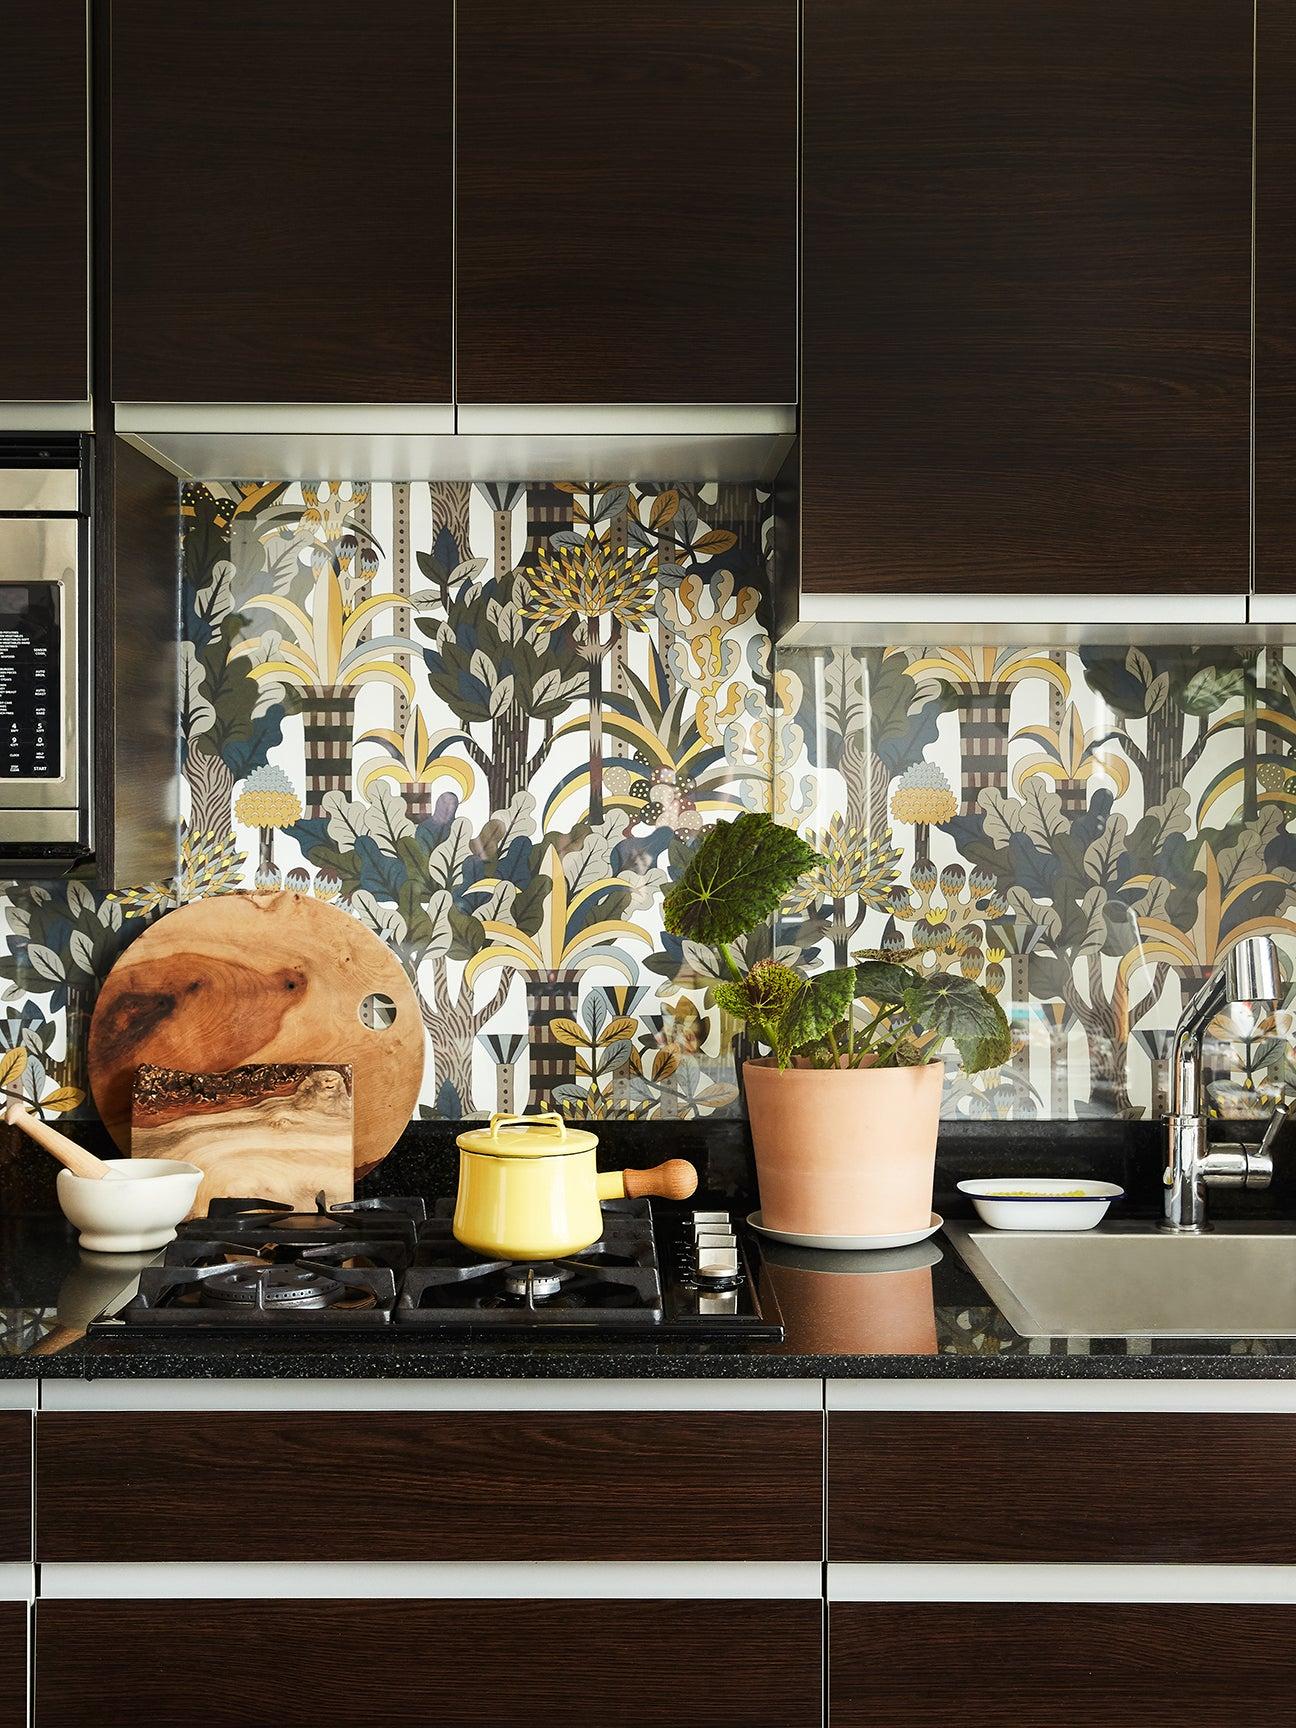 Domino Executive Creative Director Kate Berry's DIY Backsplash Is Totally Rental-Friendly